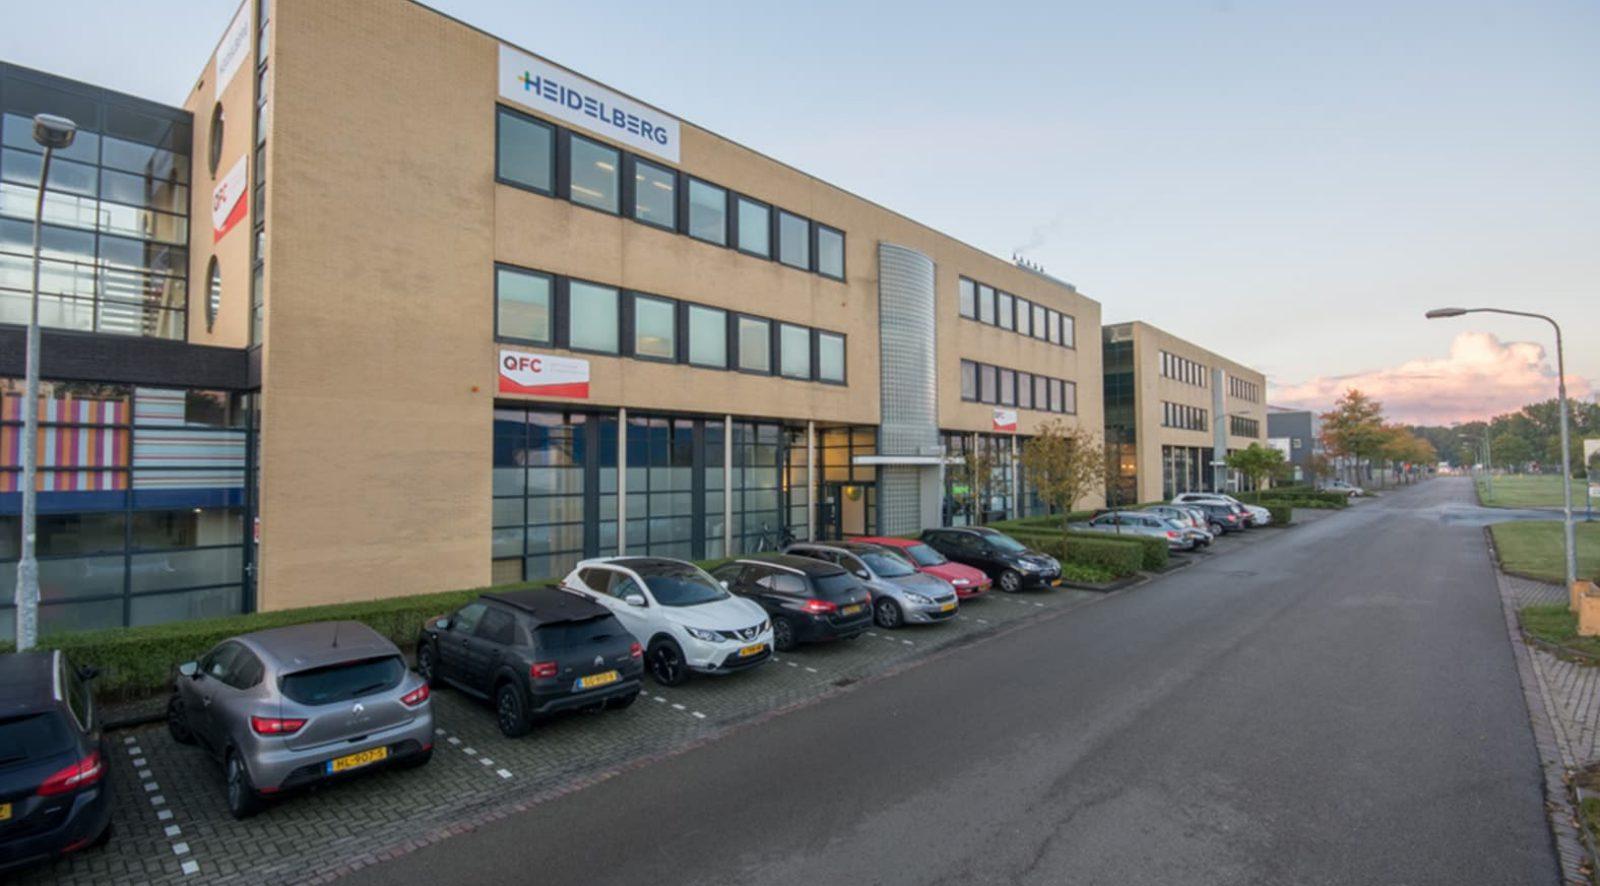 Crown Business Center II in Haarlem